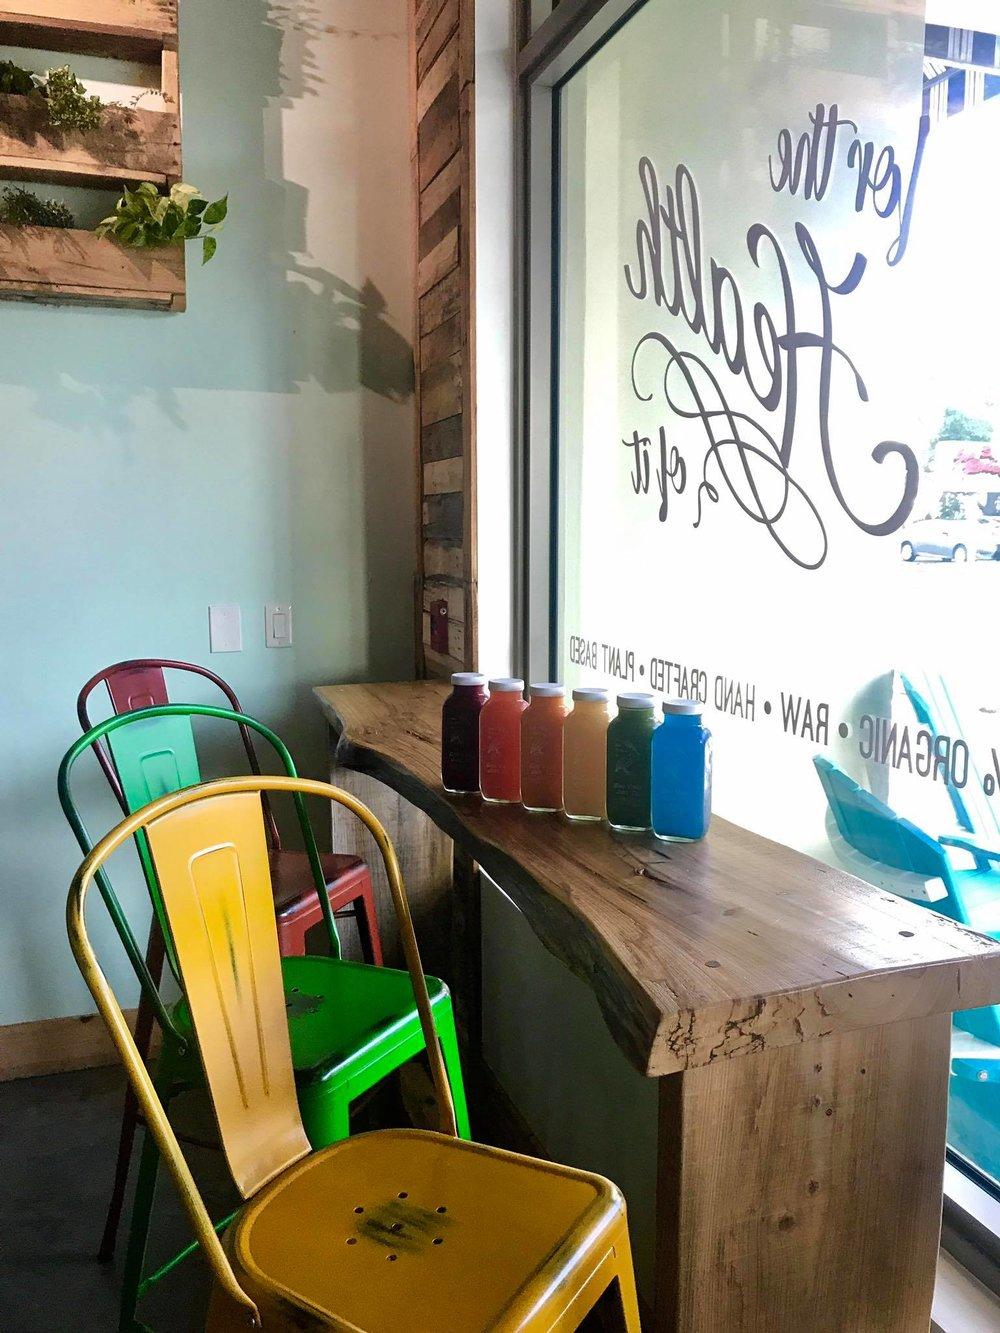 Caffeinated-Bakery-Ocean-Friendly2.jpg